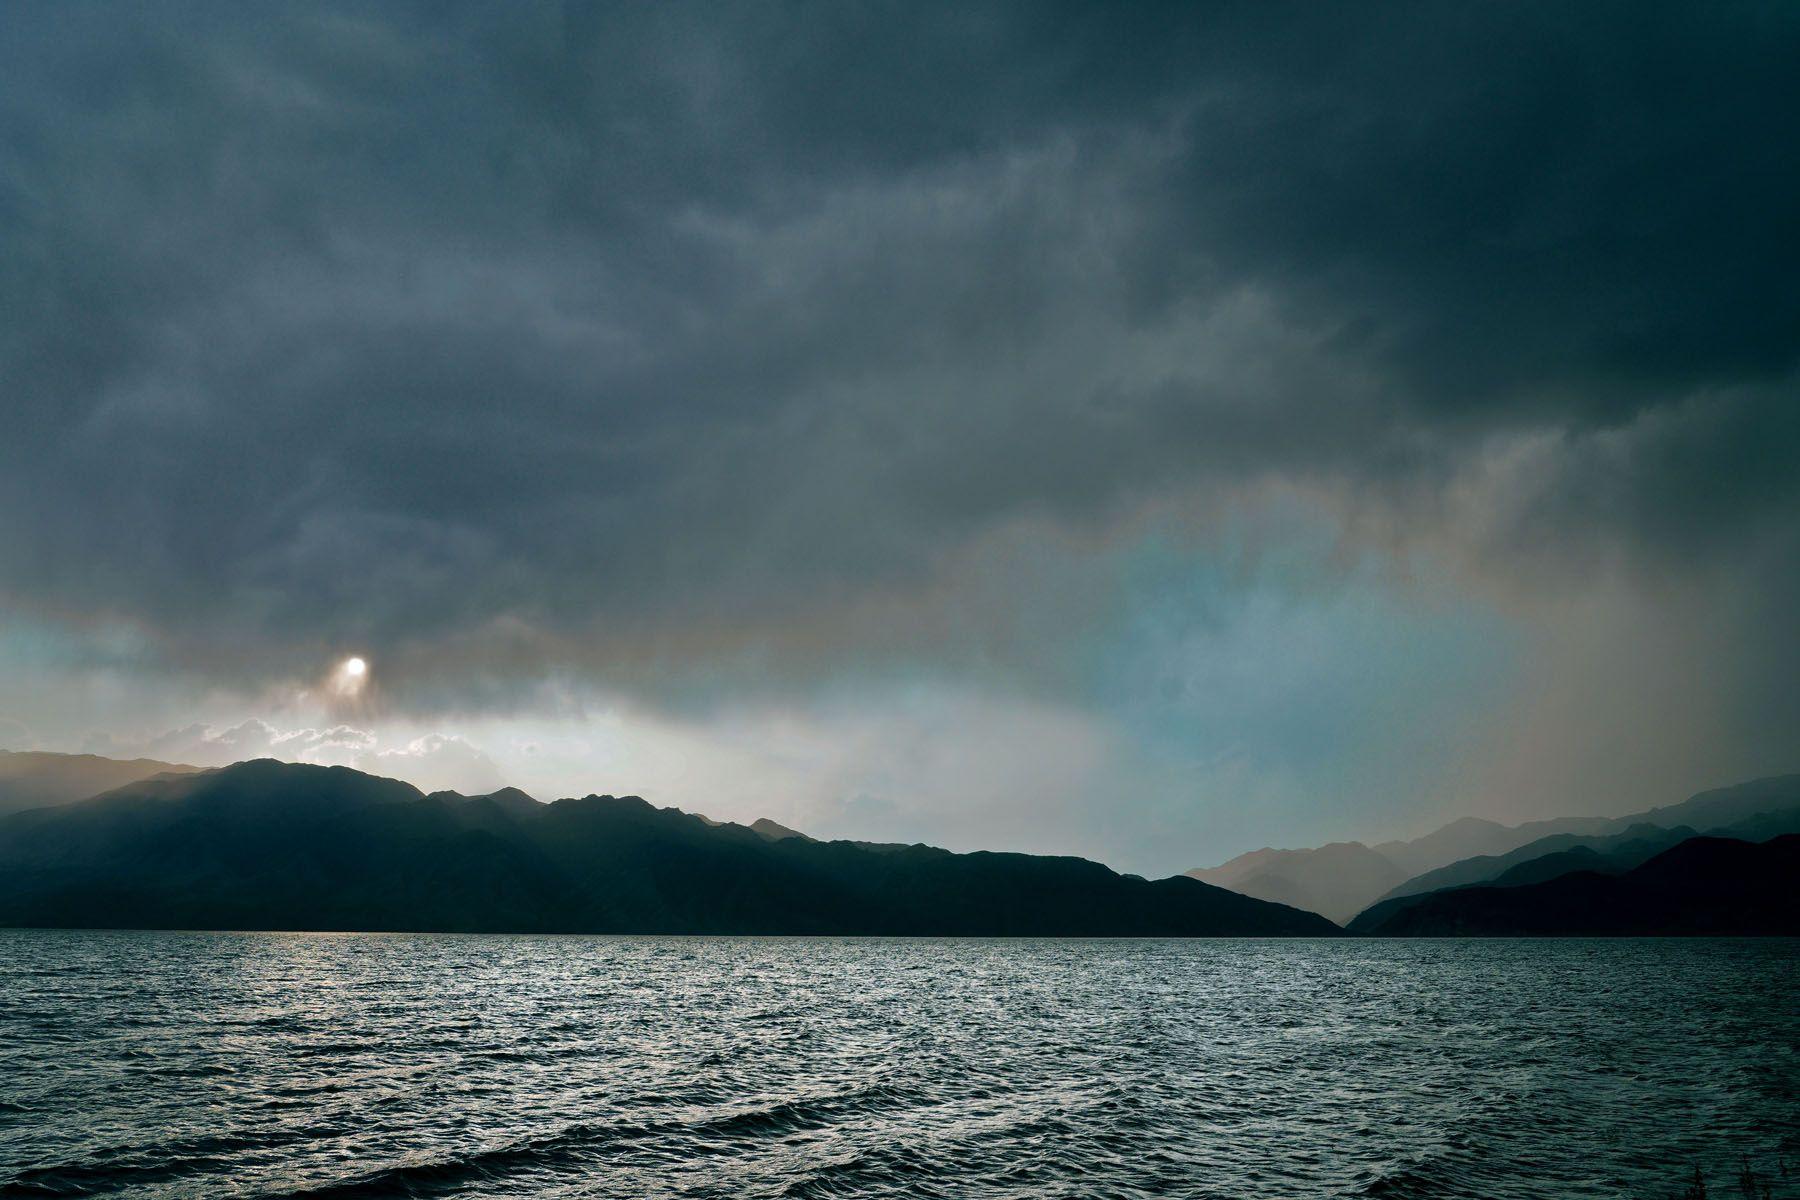 Водохранилище Бартогай - Казахстан